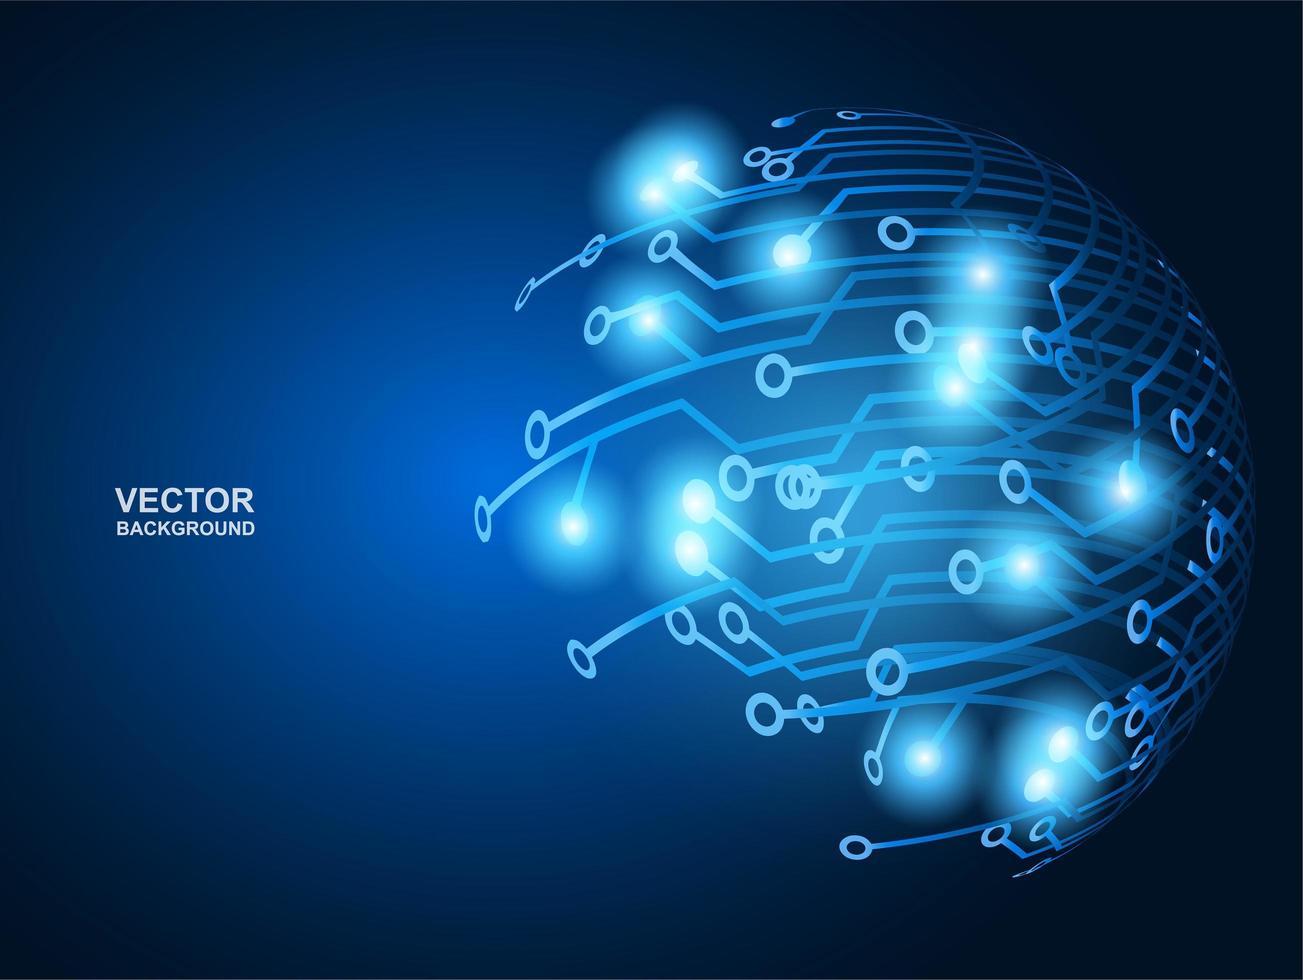 design de círculo azul brilhante de alta tecnologia vetor